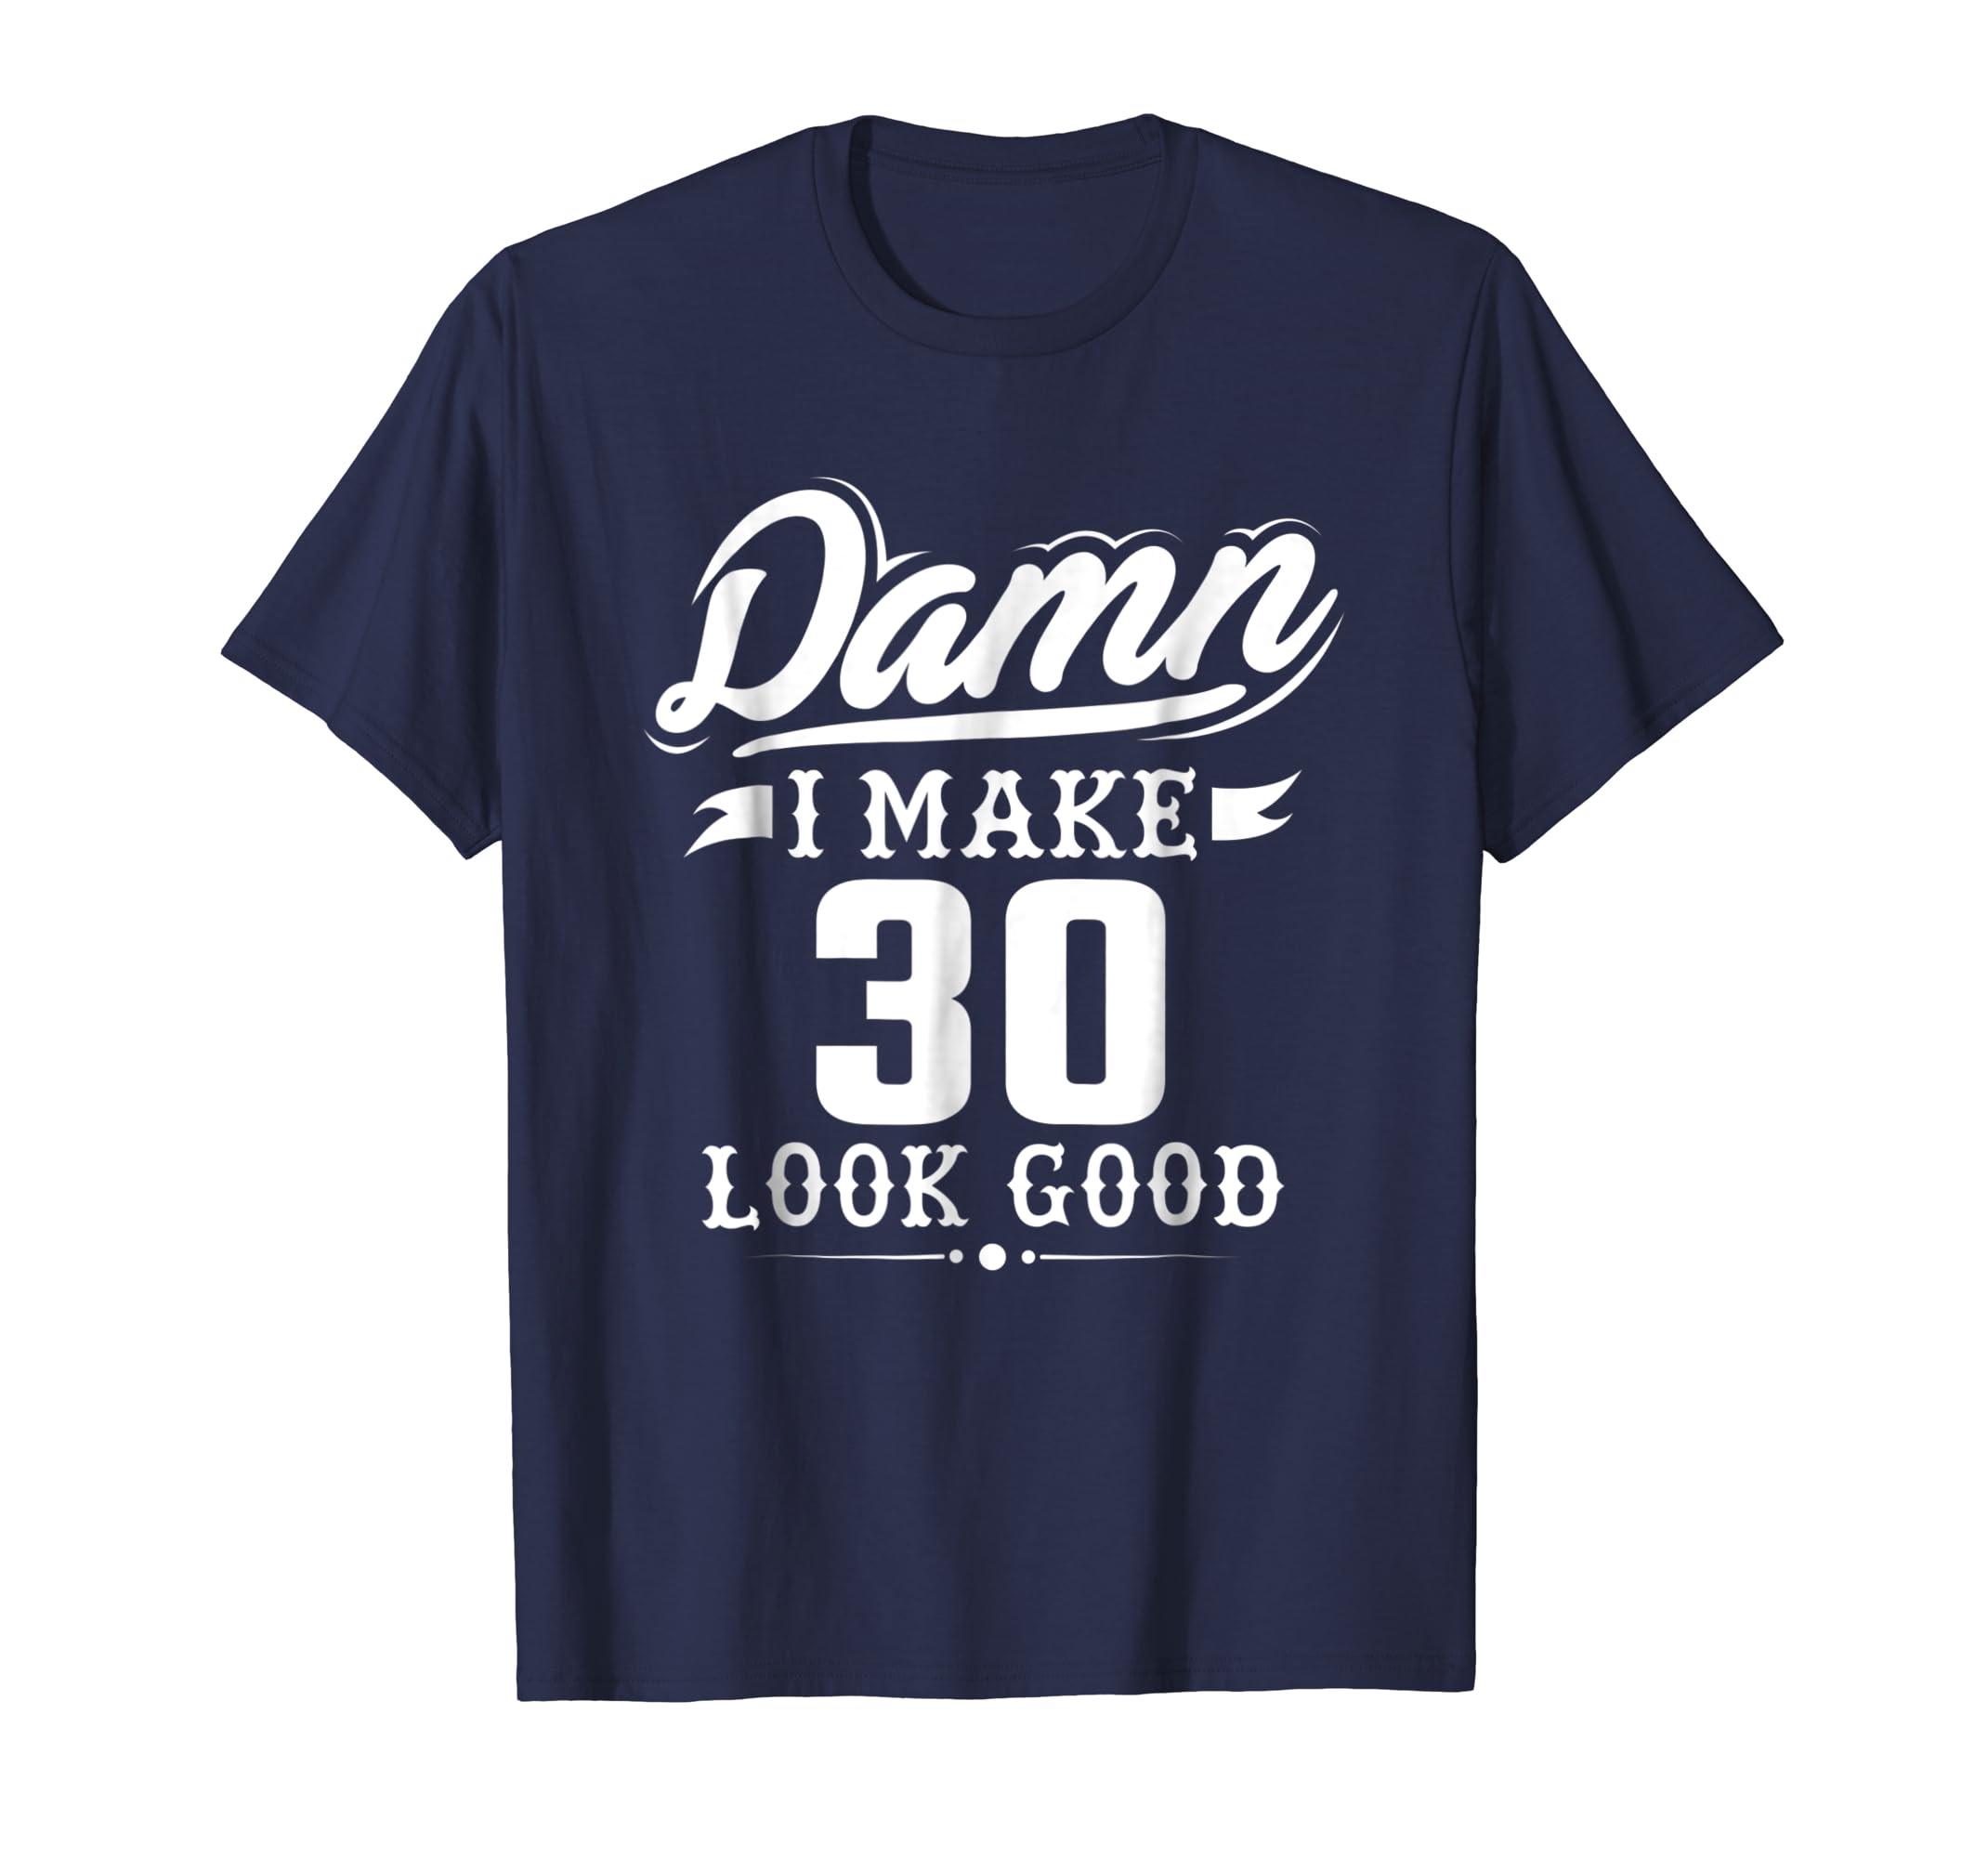 Damn I Make 30 Look Good Tshirt   Funny 30th Birthday Gift-Awarplus